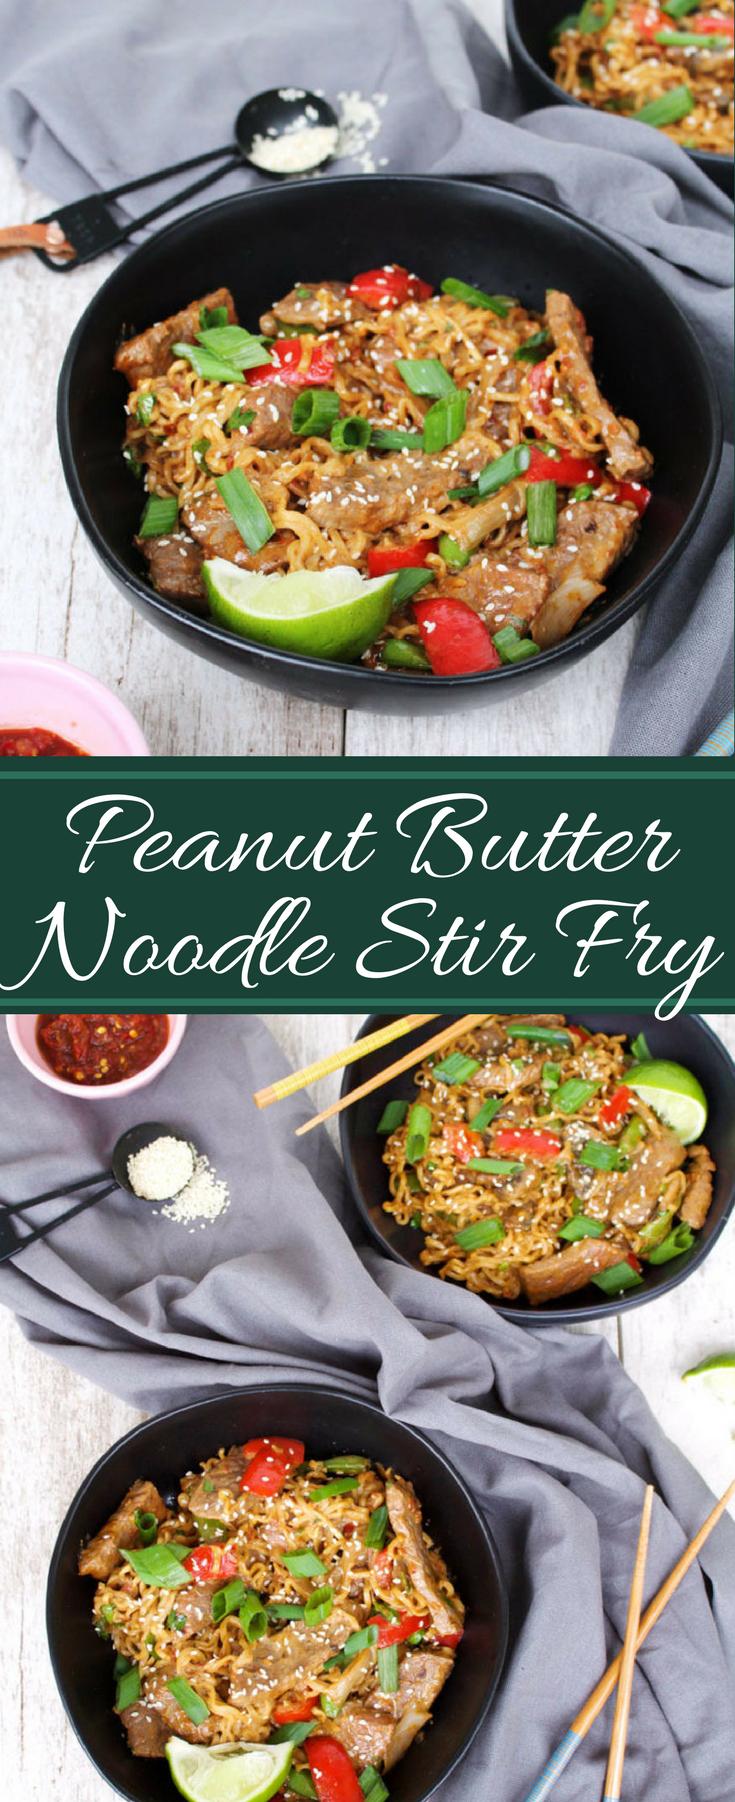 Peanut Butter Asian Noodle Stir Fry Stir Fry Asian Recipes